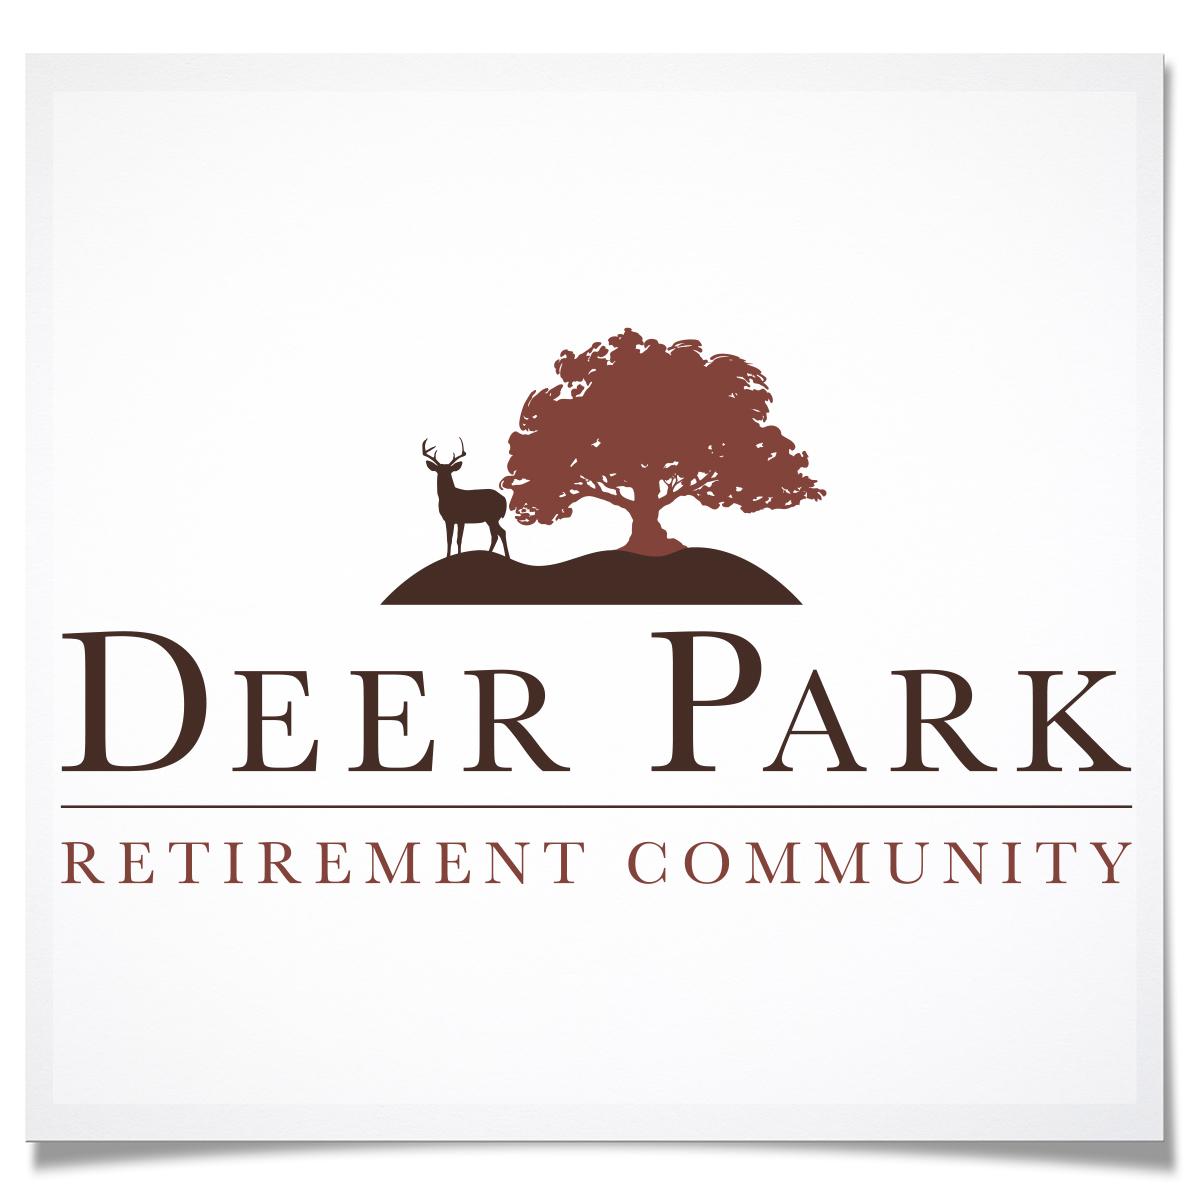 Deer Park Retirement Community